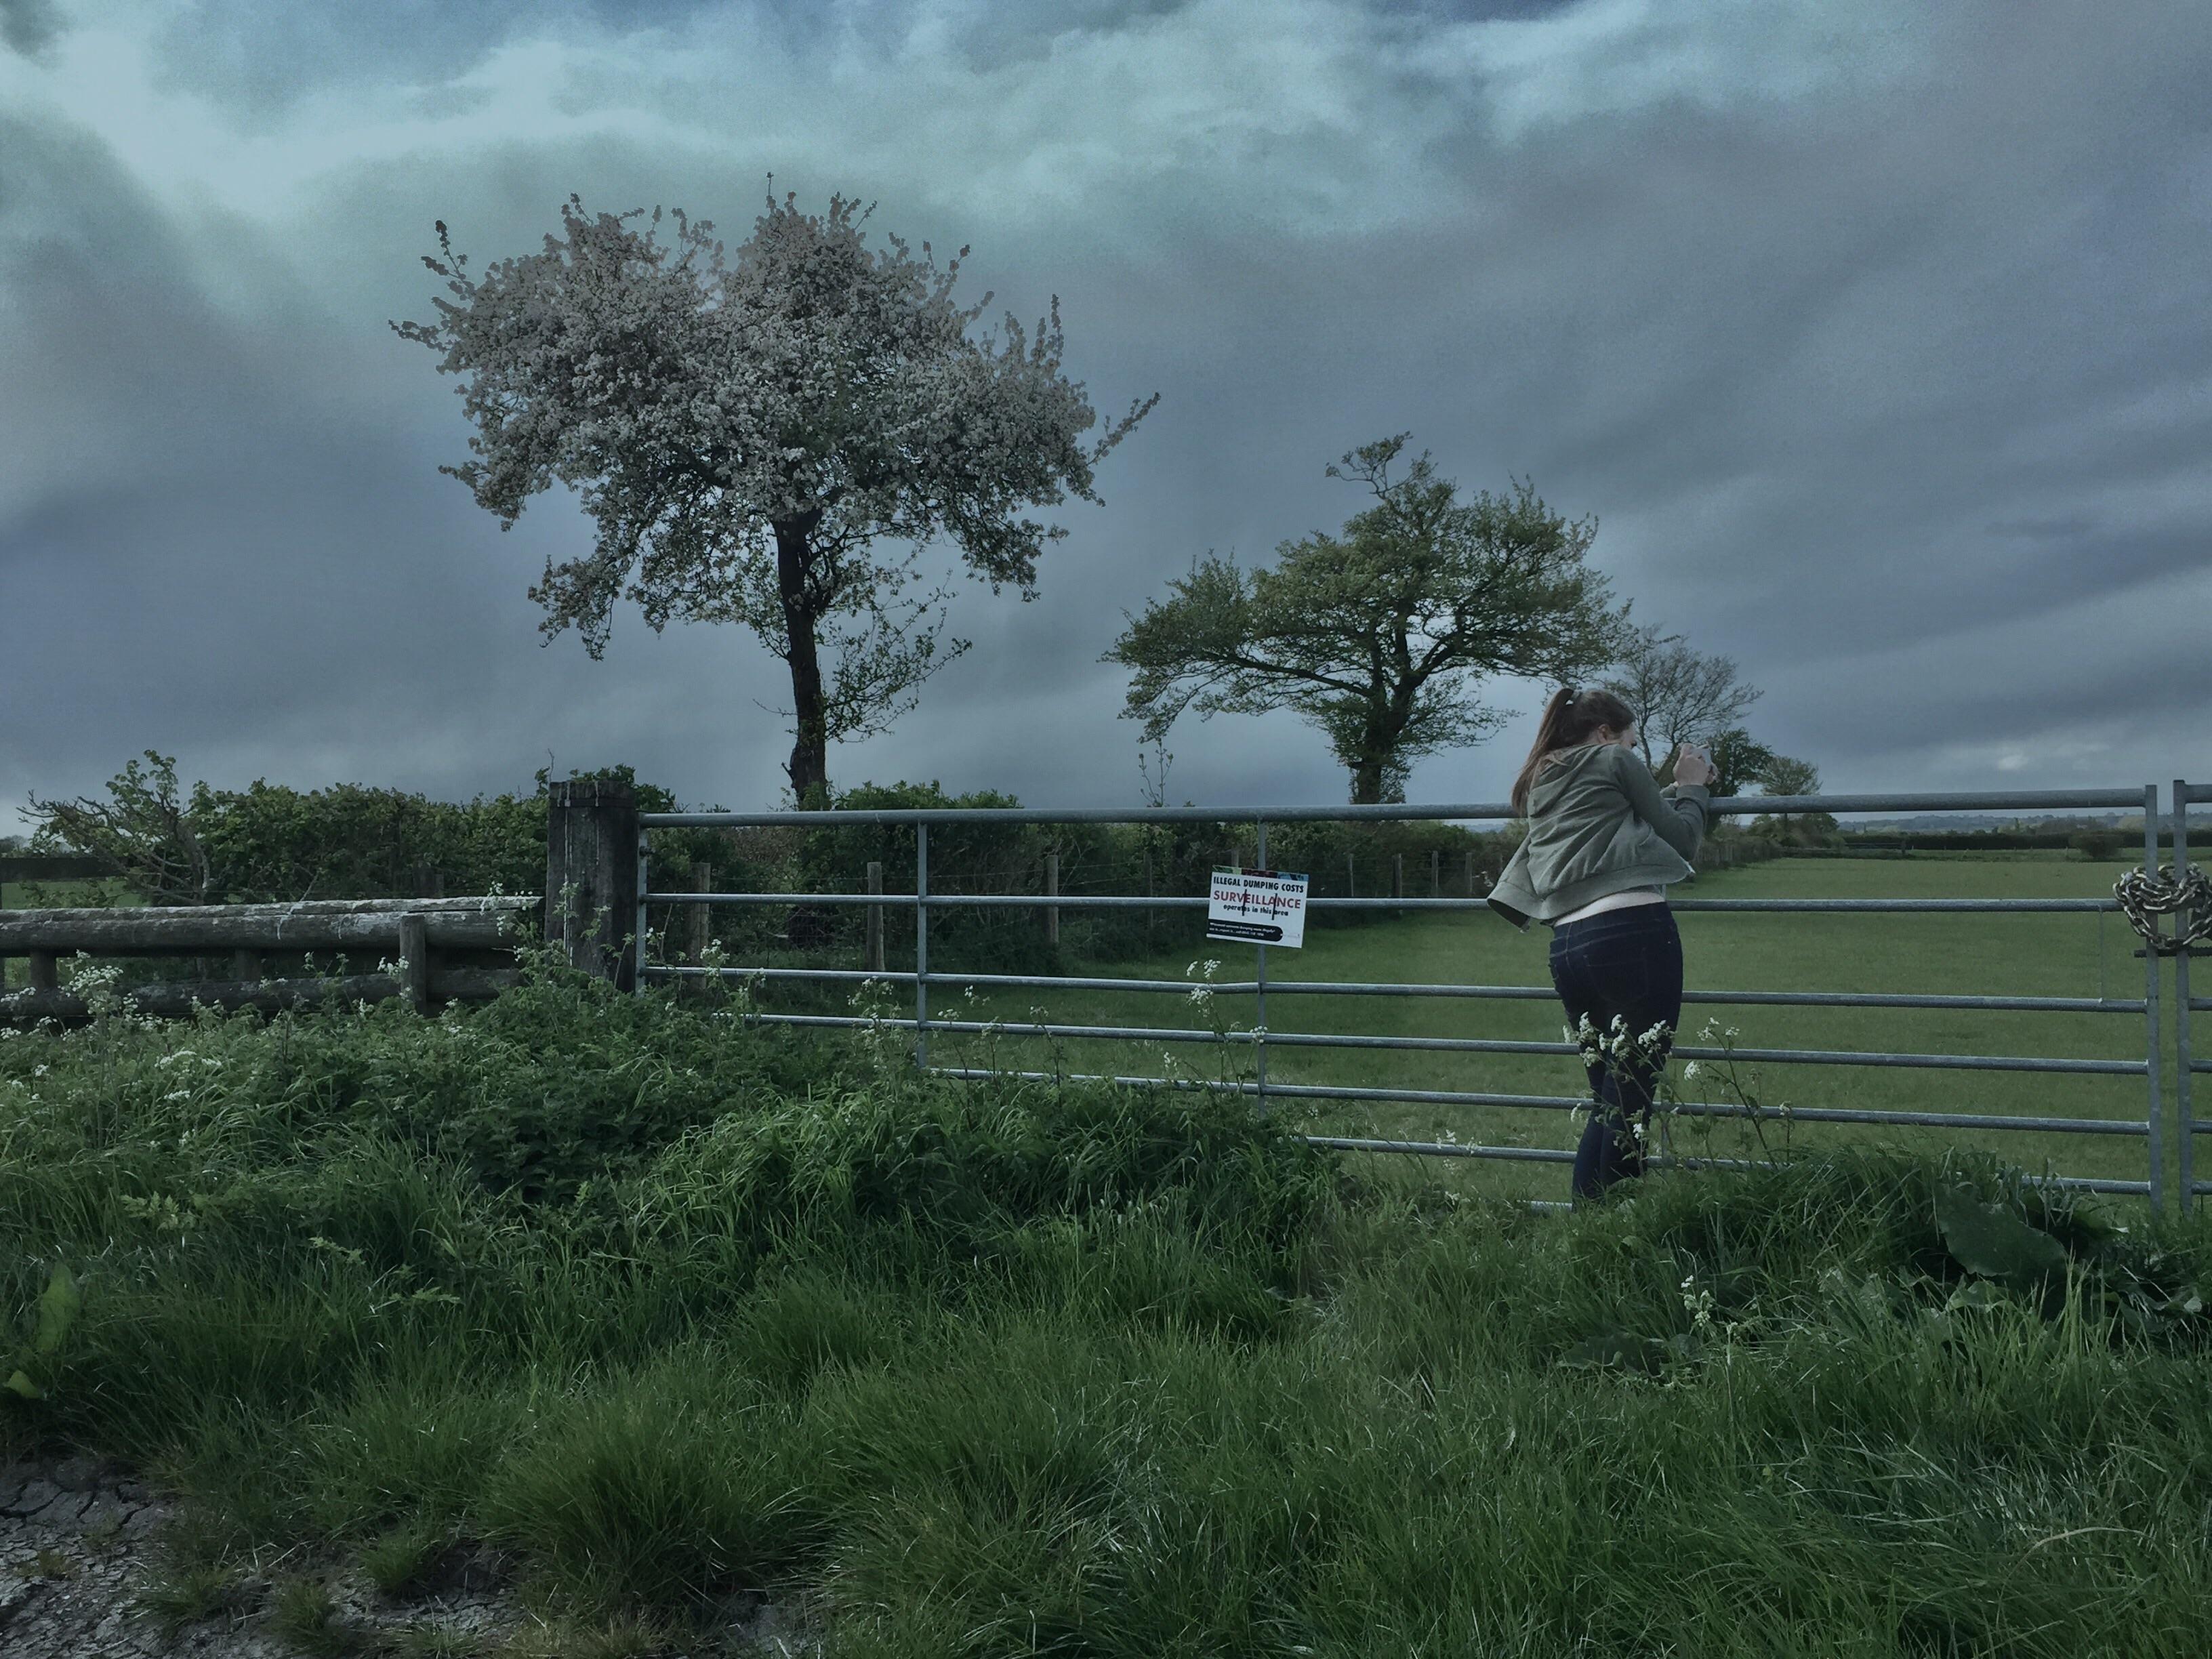 Cloudy Kimblewick. Buckinghamshire England.